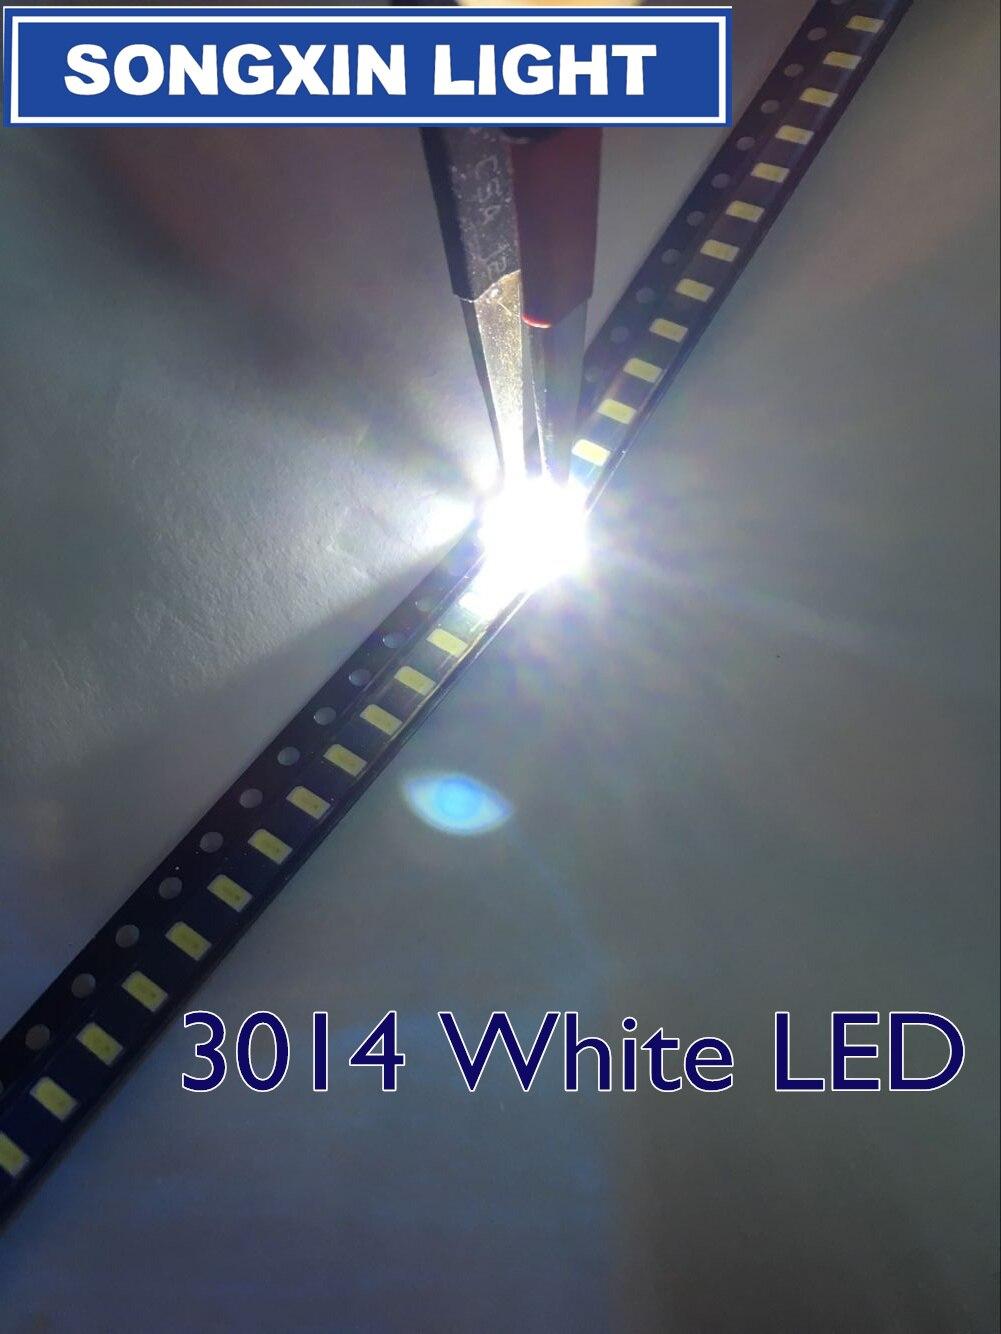 8000 piezas 3014 blanco SMD LED de 3,0-3,2 v 30mA 9-10LM * 3,0*1,4 MM 6000-6500k 0,1 w 3014 smd led diodos